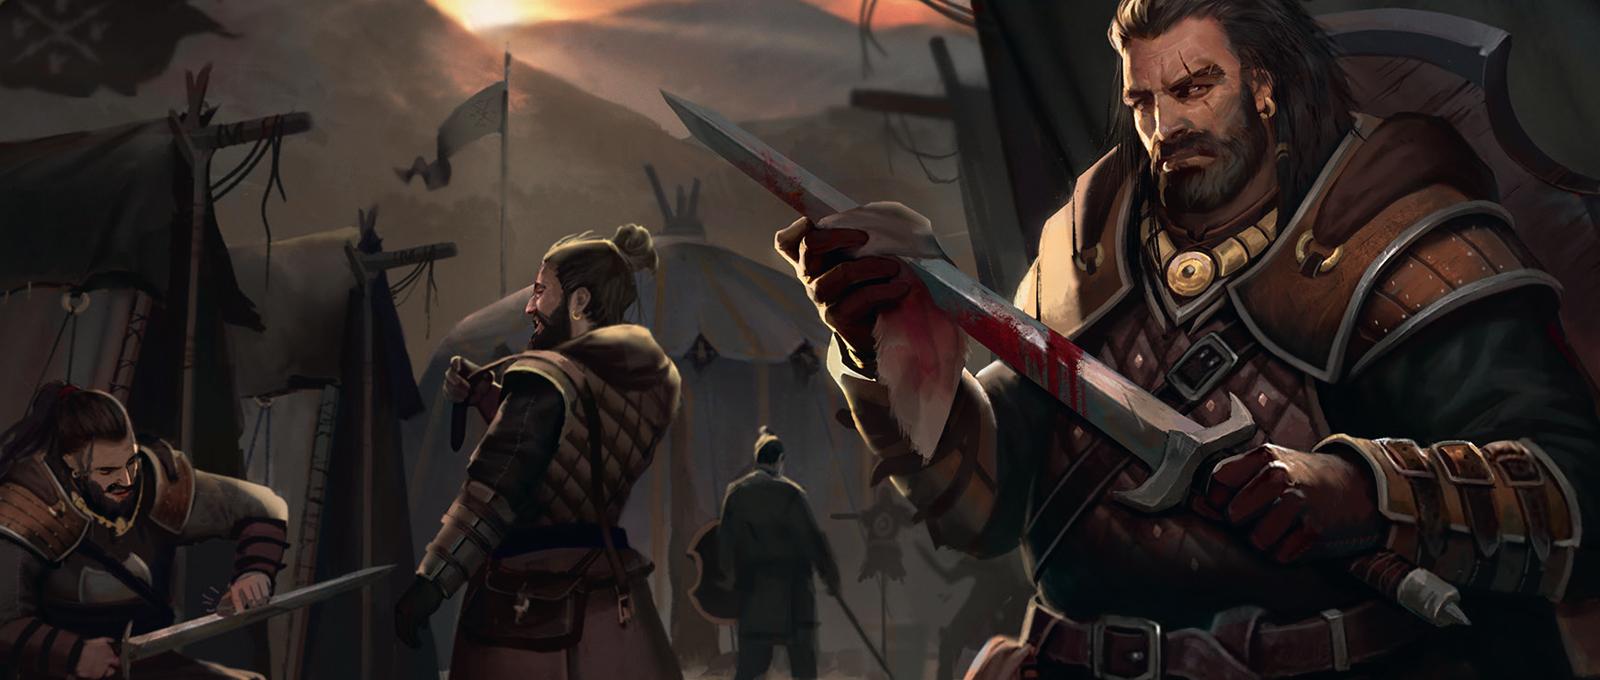 SIF_Stormcrow_Mercenaries_Large_Hero